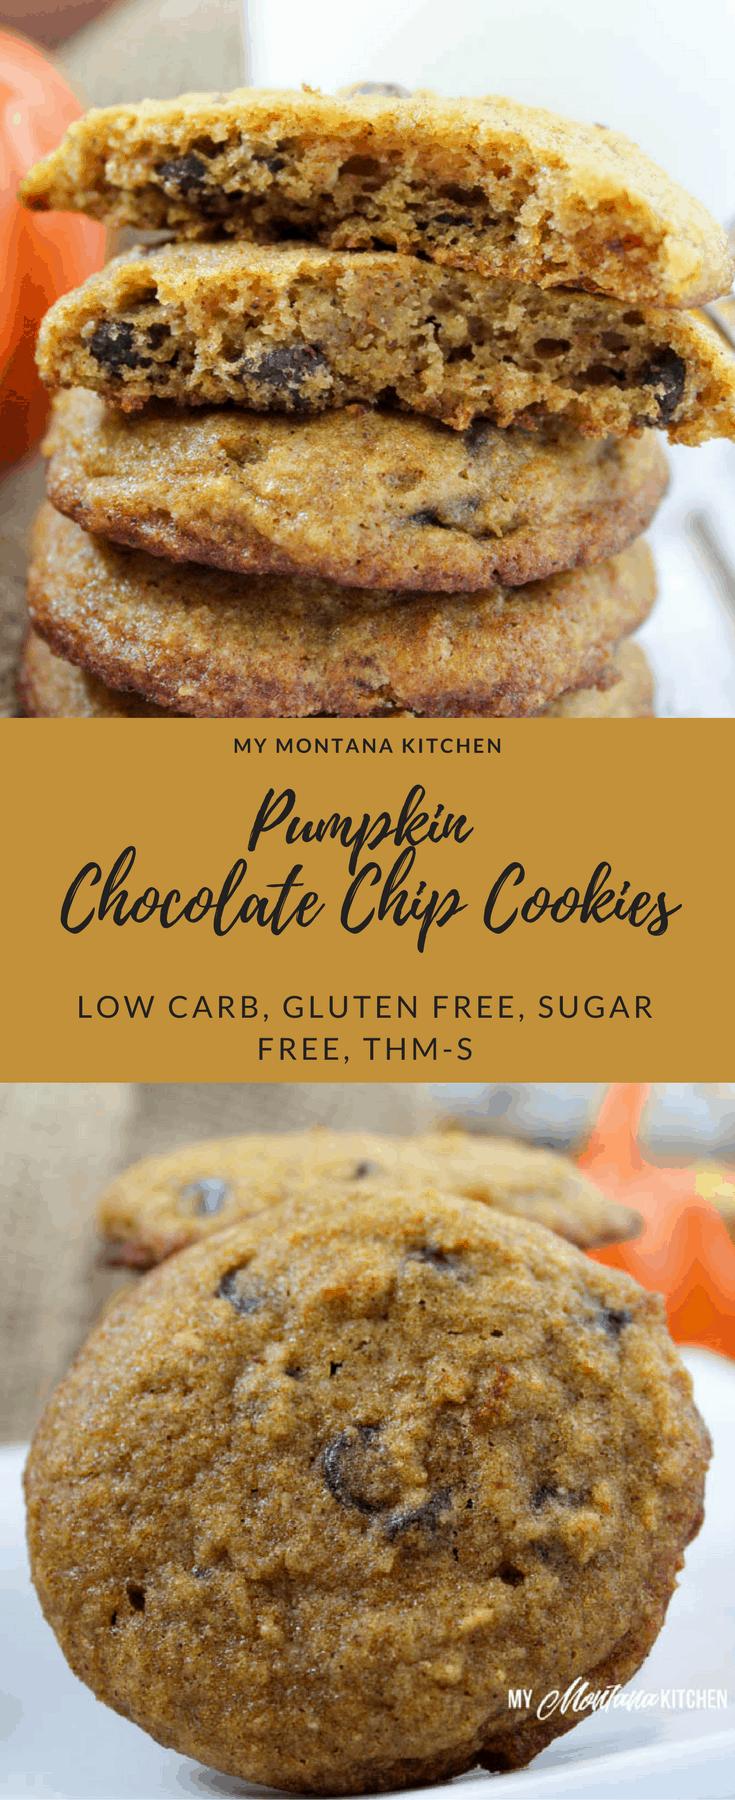 Pumpkin Chocolate Chip Cookies - My Montana Kitchen